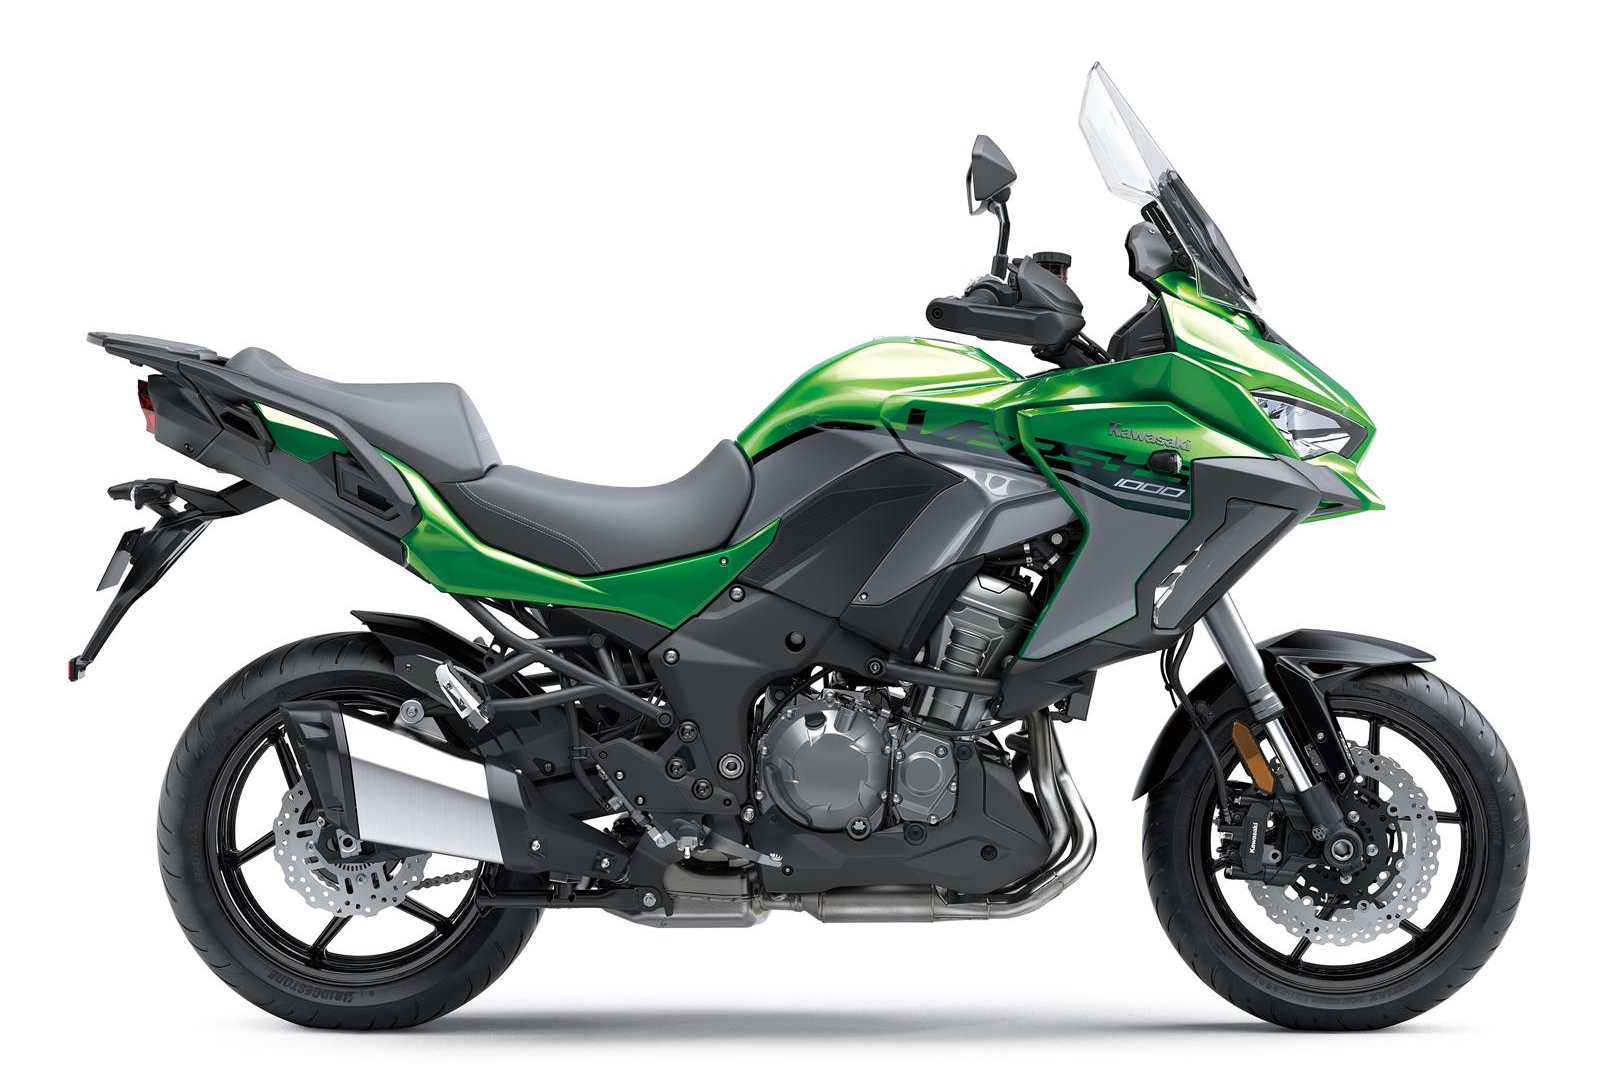 Nowy Kawasaki Versys 1000 SE model 2020